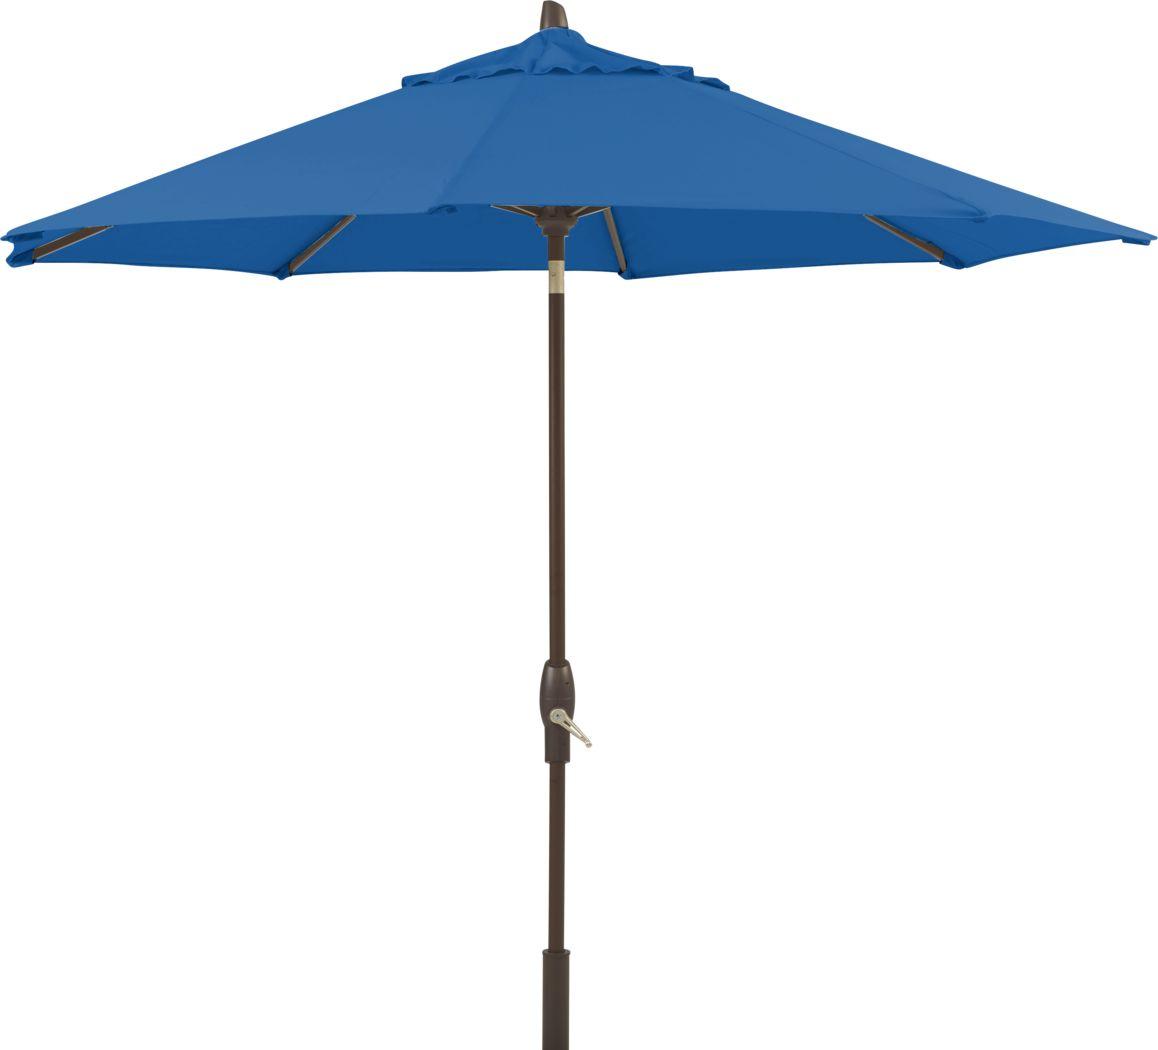 Seaport 9' Octagon Ocean Outdoor Umbrella